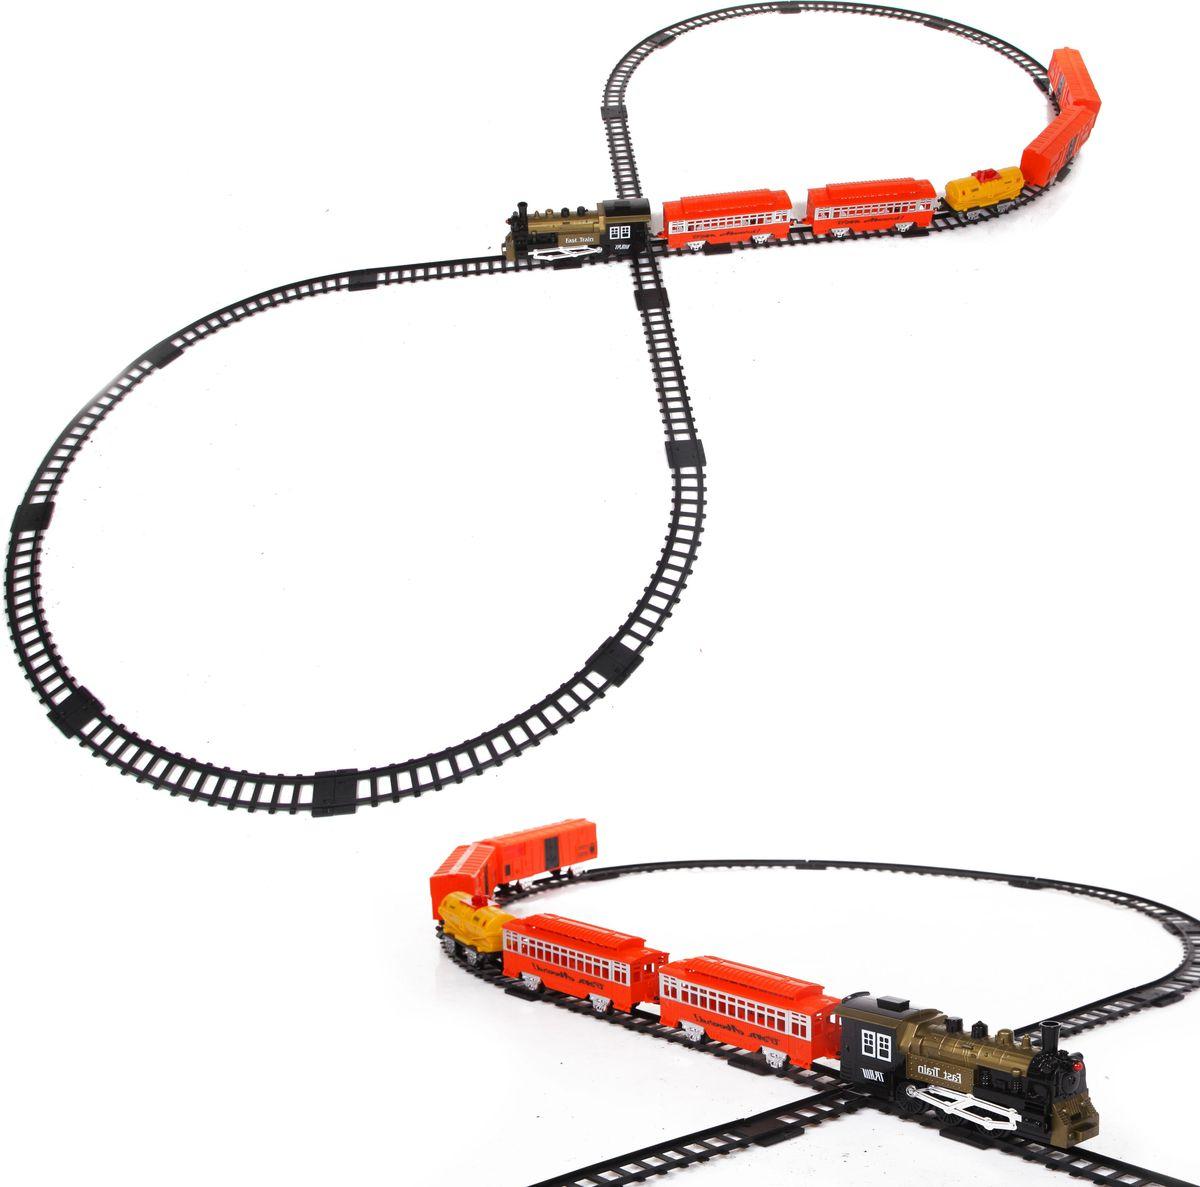 Yako Железная дорога Train in Fast Y1699030 yako железная дорога classic train y1699032